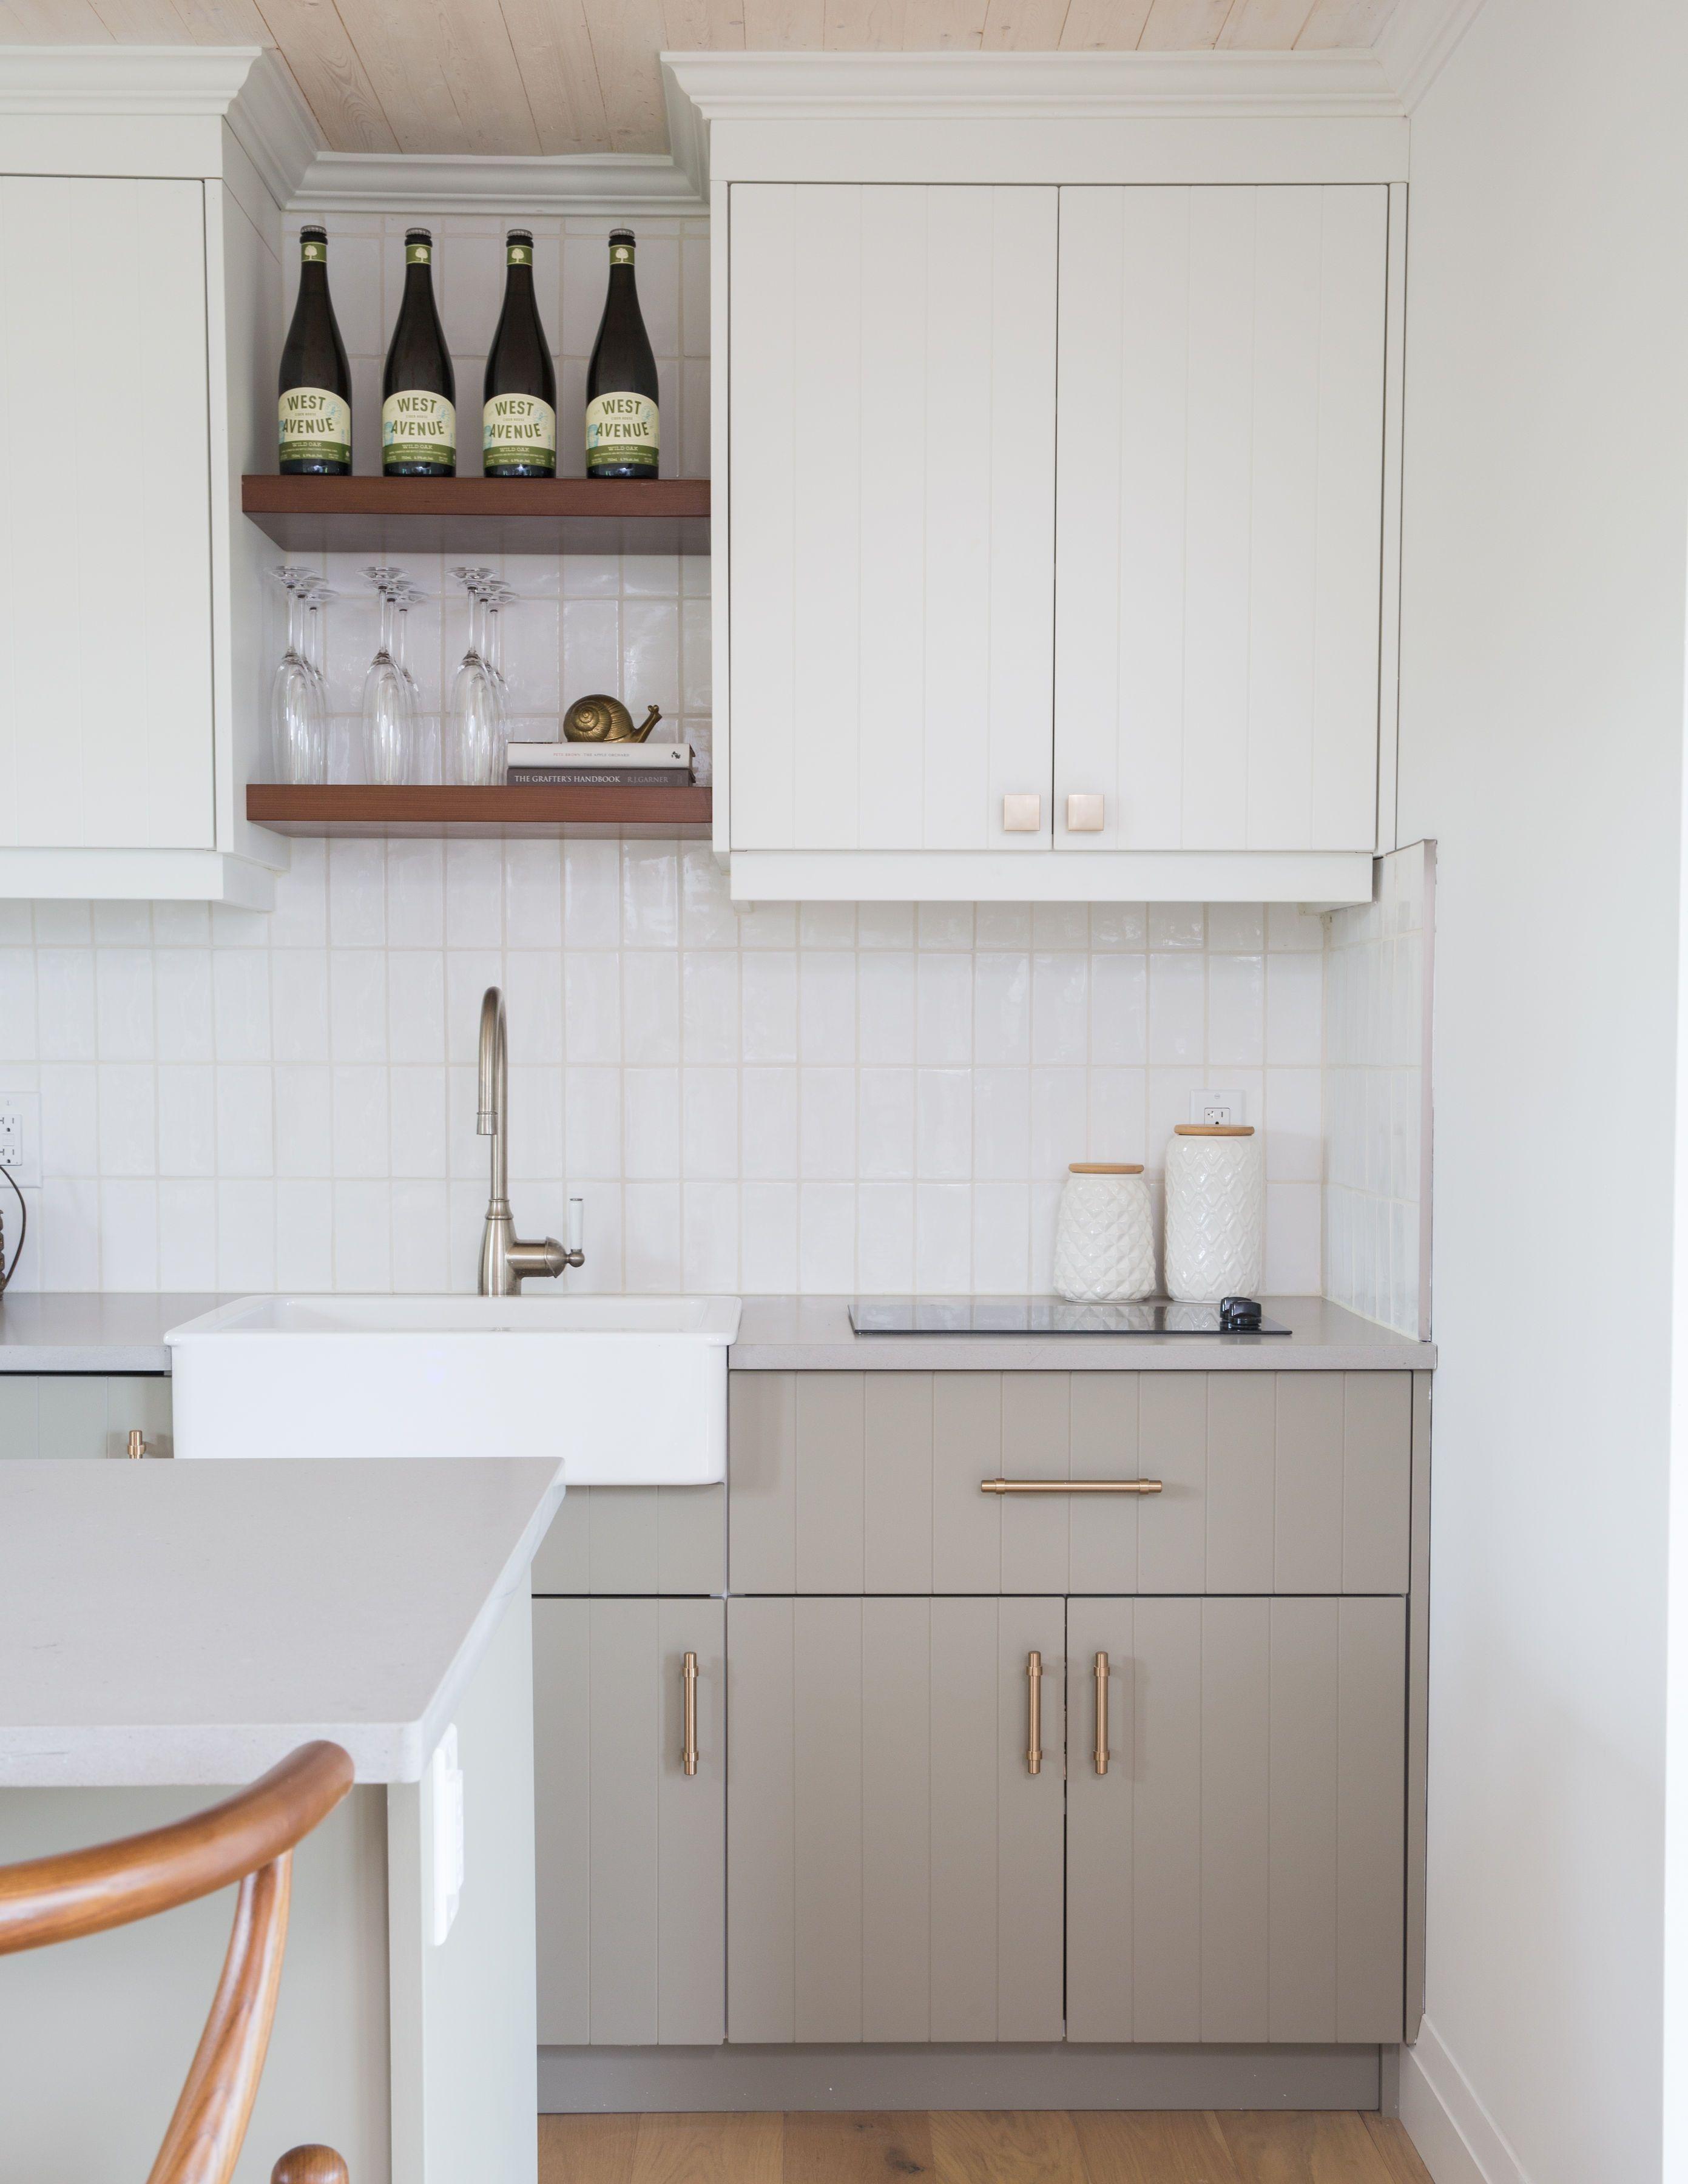 Charming Cozy Cabin With Modern Beadboard Doors Beadboard Kitchen Beadboard Kitchen Cabinets Kitchen Renovation